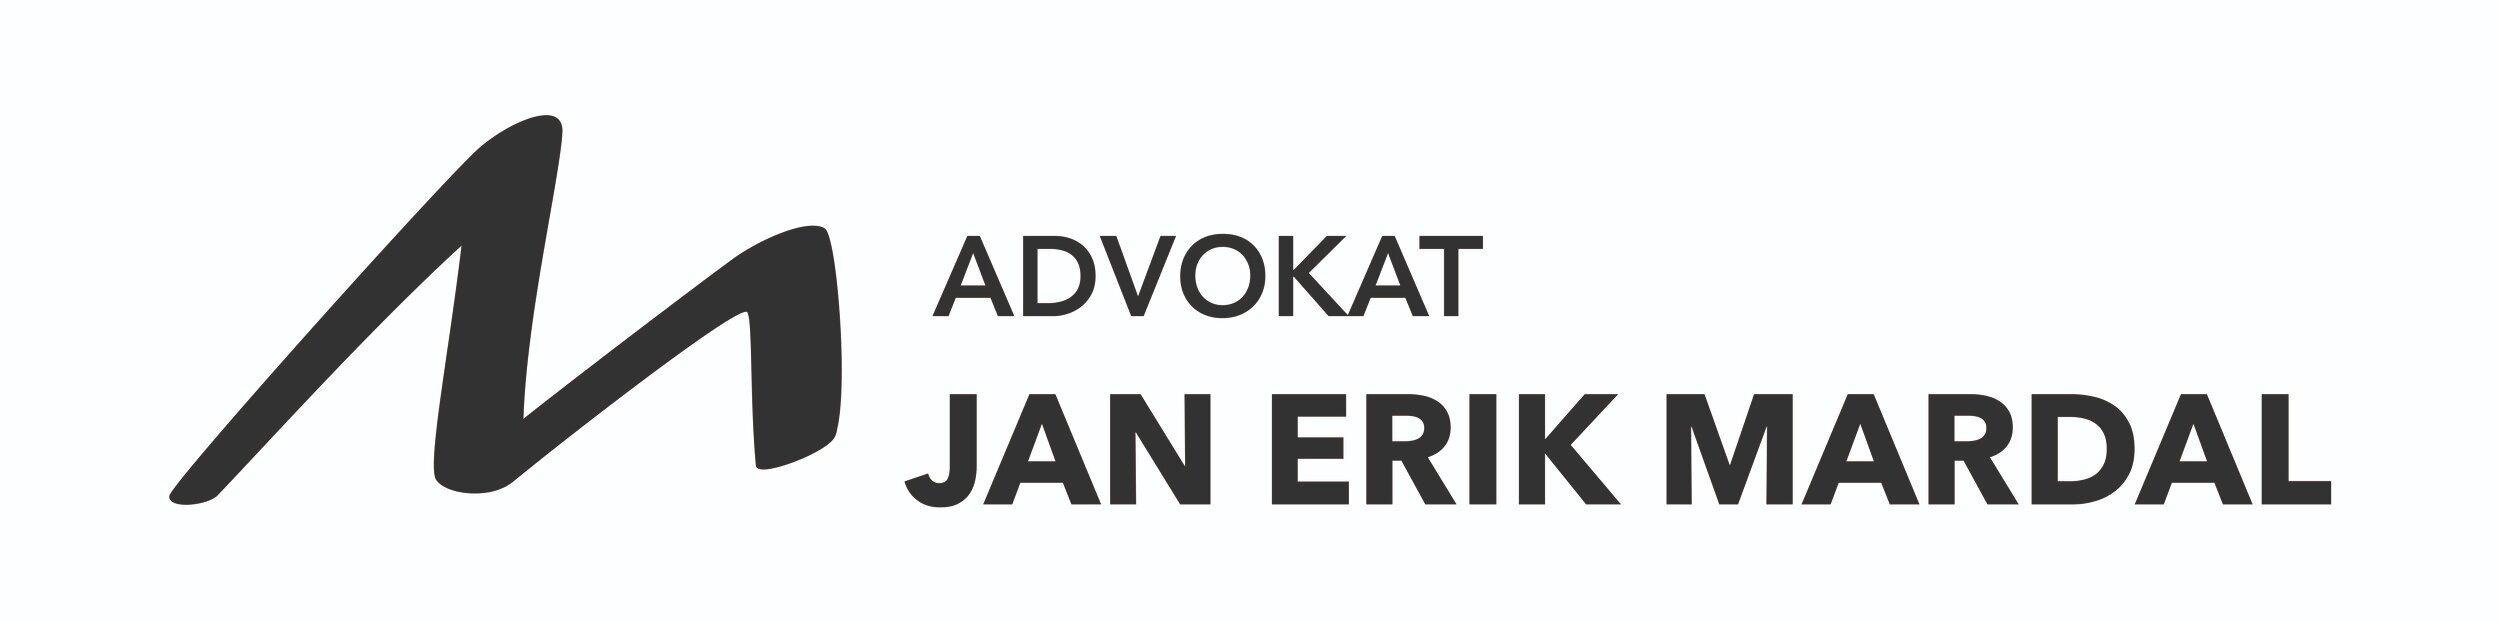 Logo-svart-Jan-Erik-Mardal.jpg